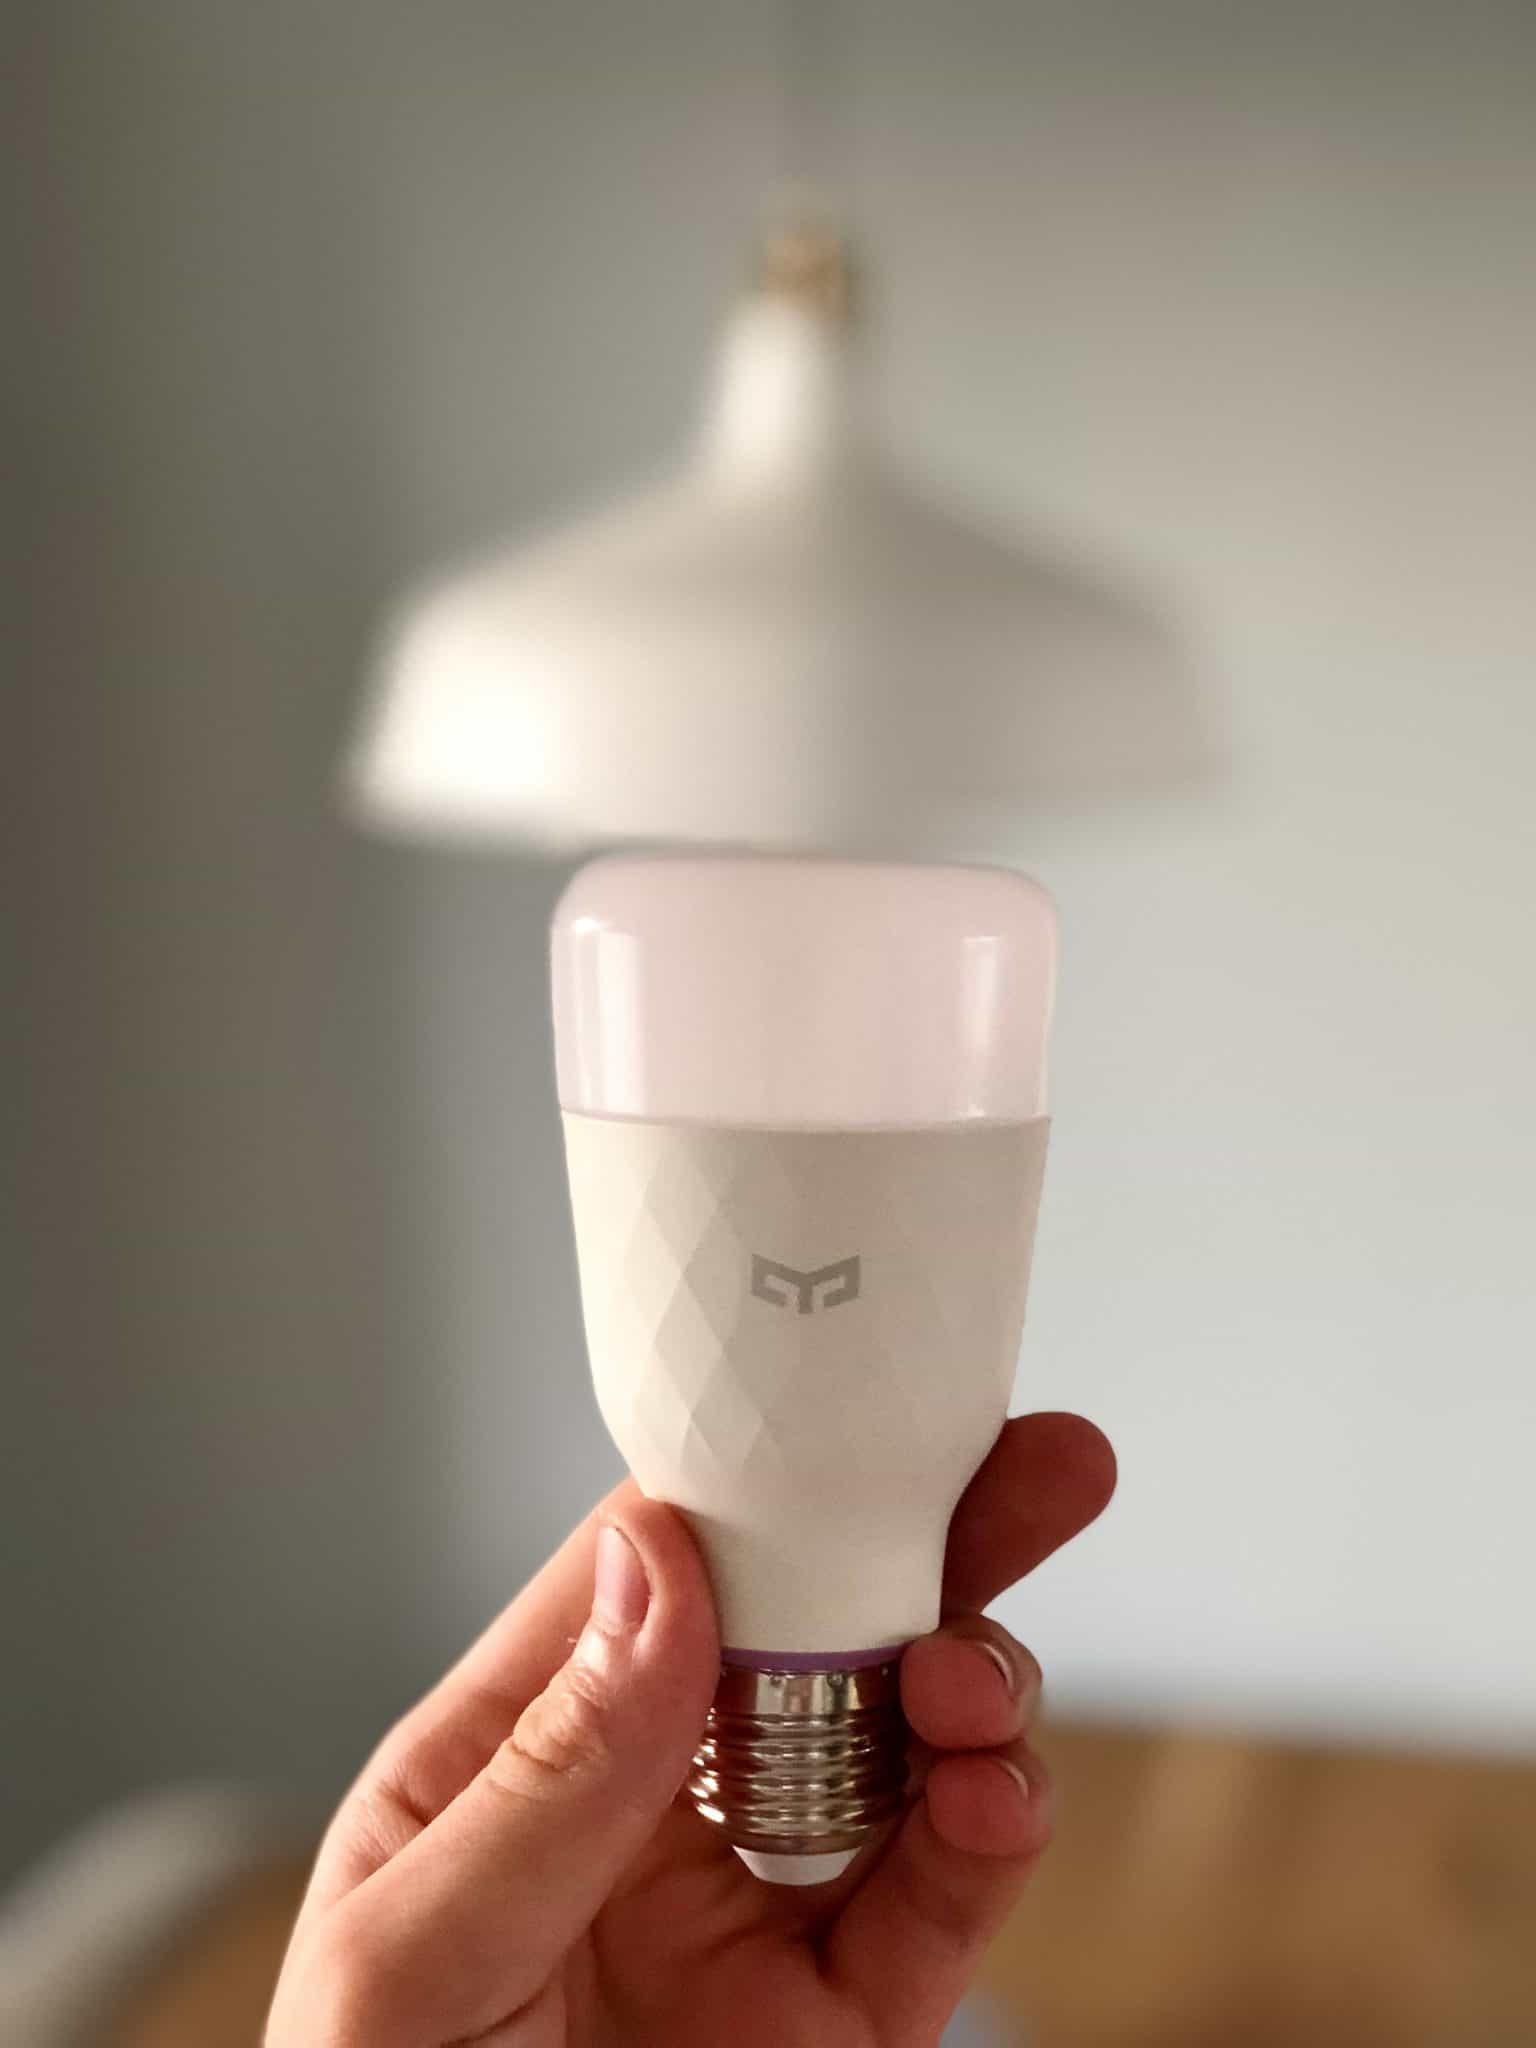 Review of the YEELIGHT YLDP06YL Smart Light Bulb 10W RGB E27